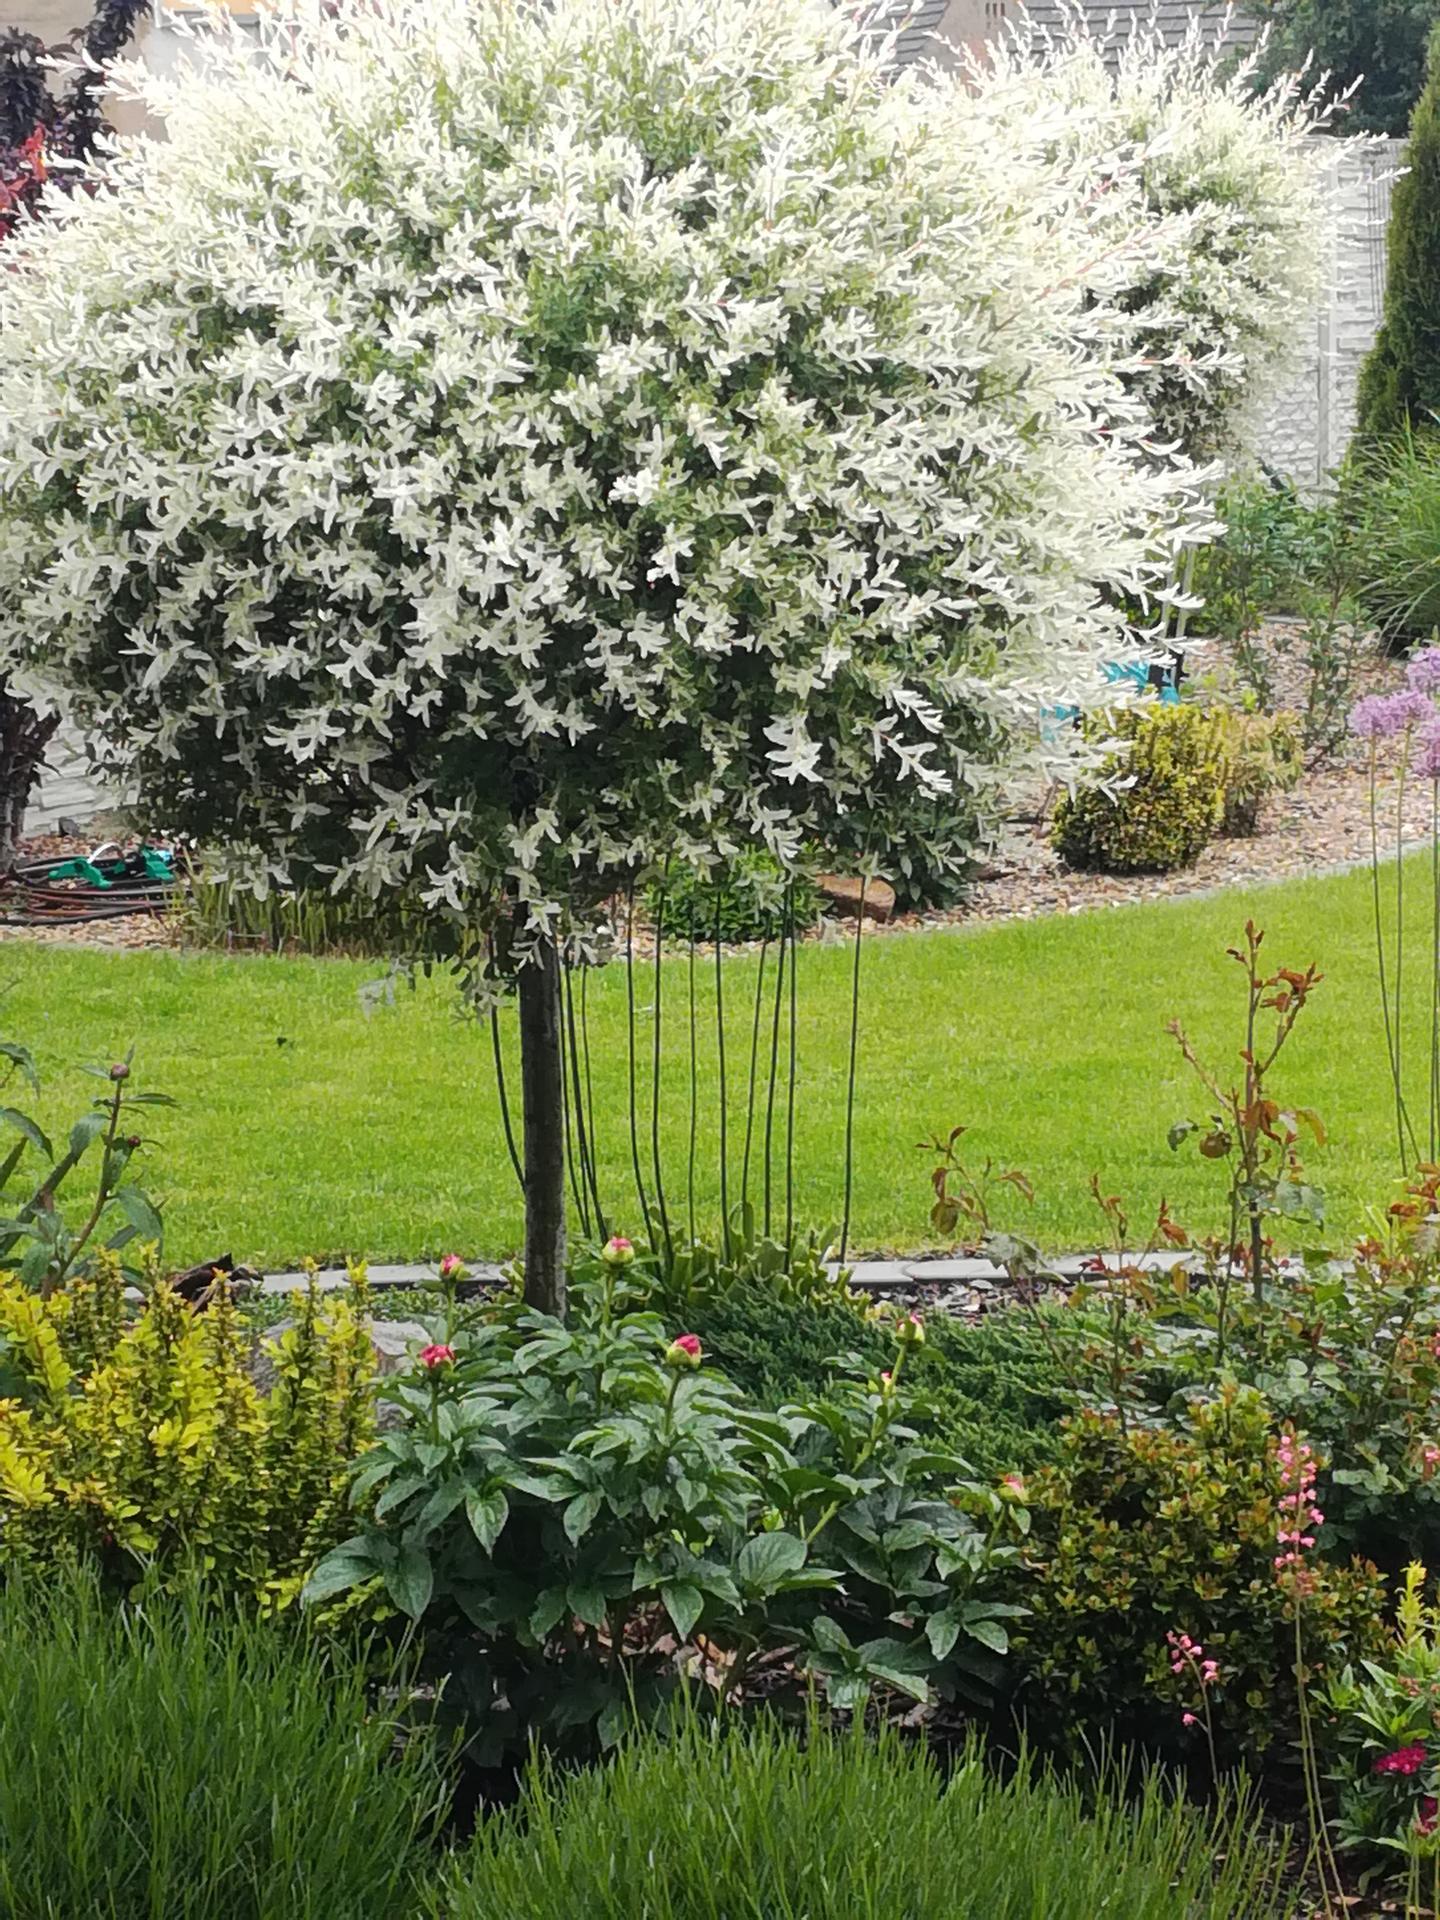 Zahrada 2021 🌲 - Obrázek č. 101